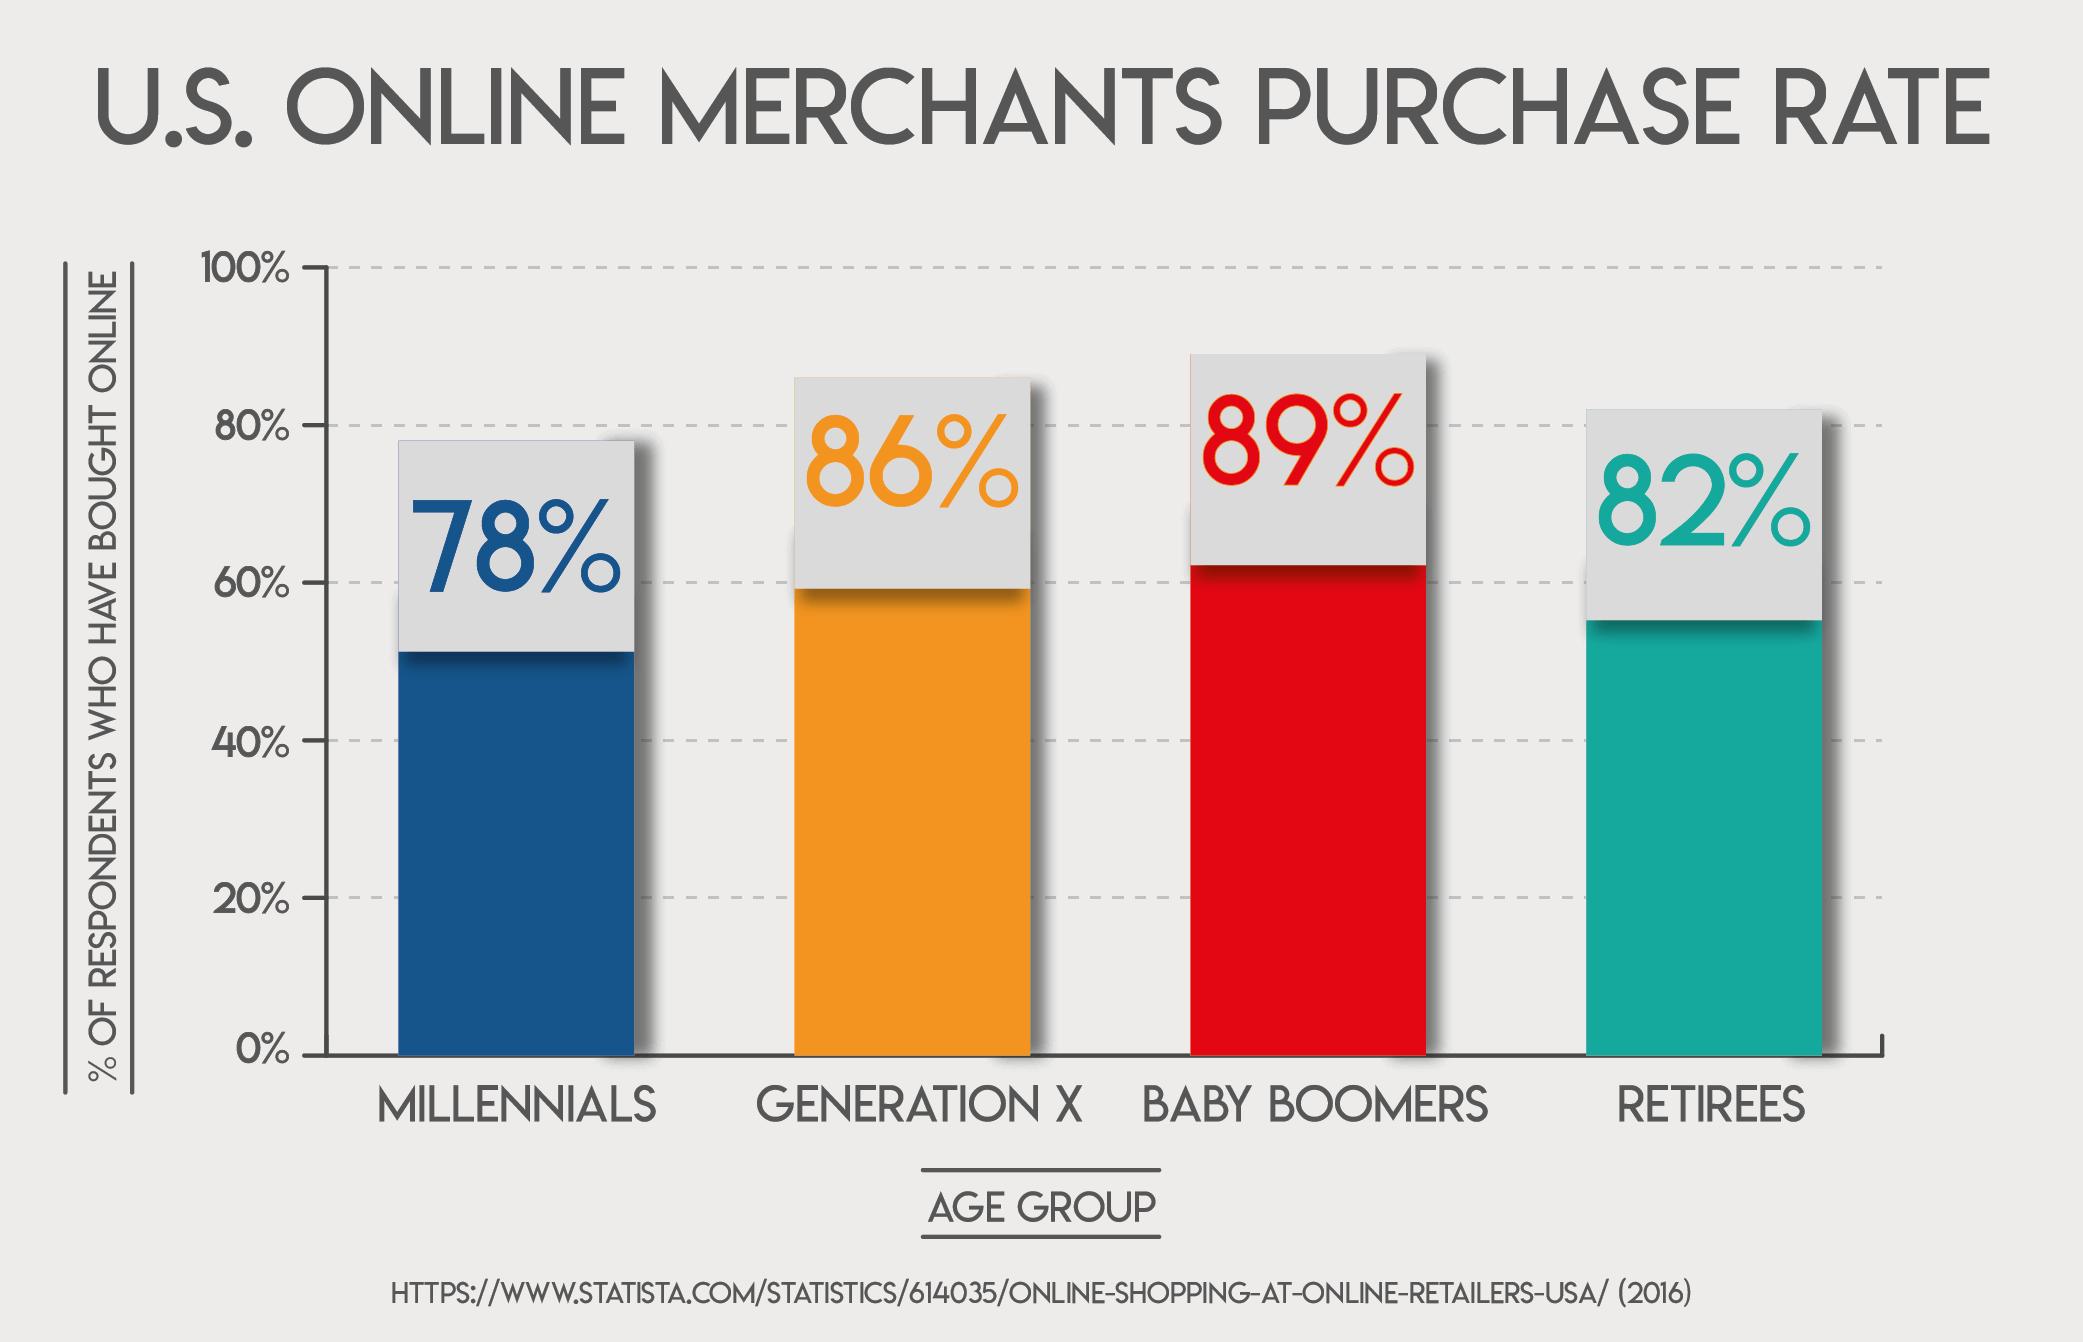 U.S. Online Merchants Purchase Rate